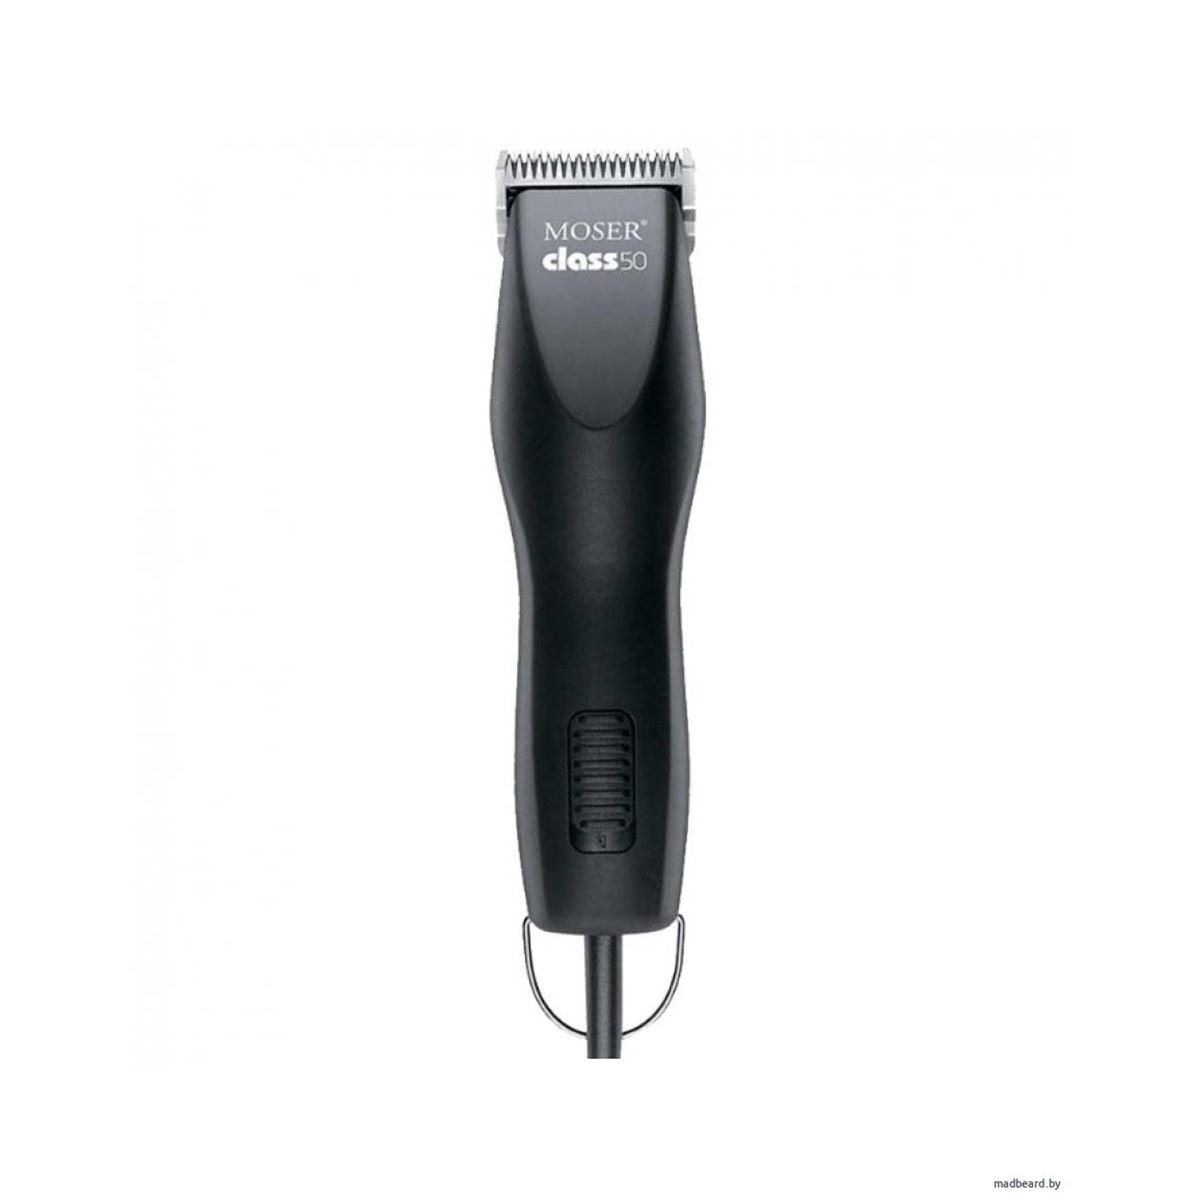 Moser  Max50 1250-0050 Çift Devirli Profesyonel Saç Kesme Makinesi